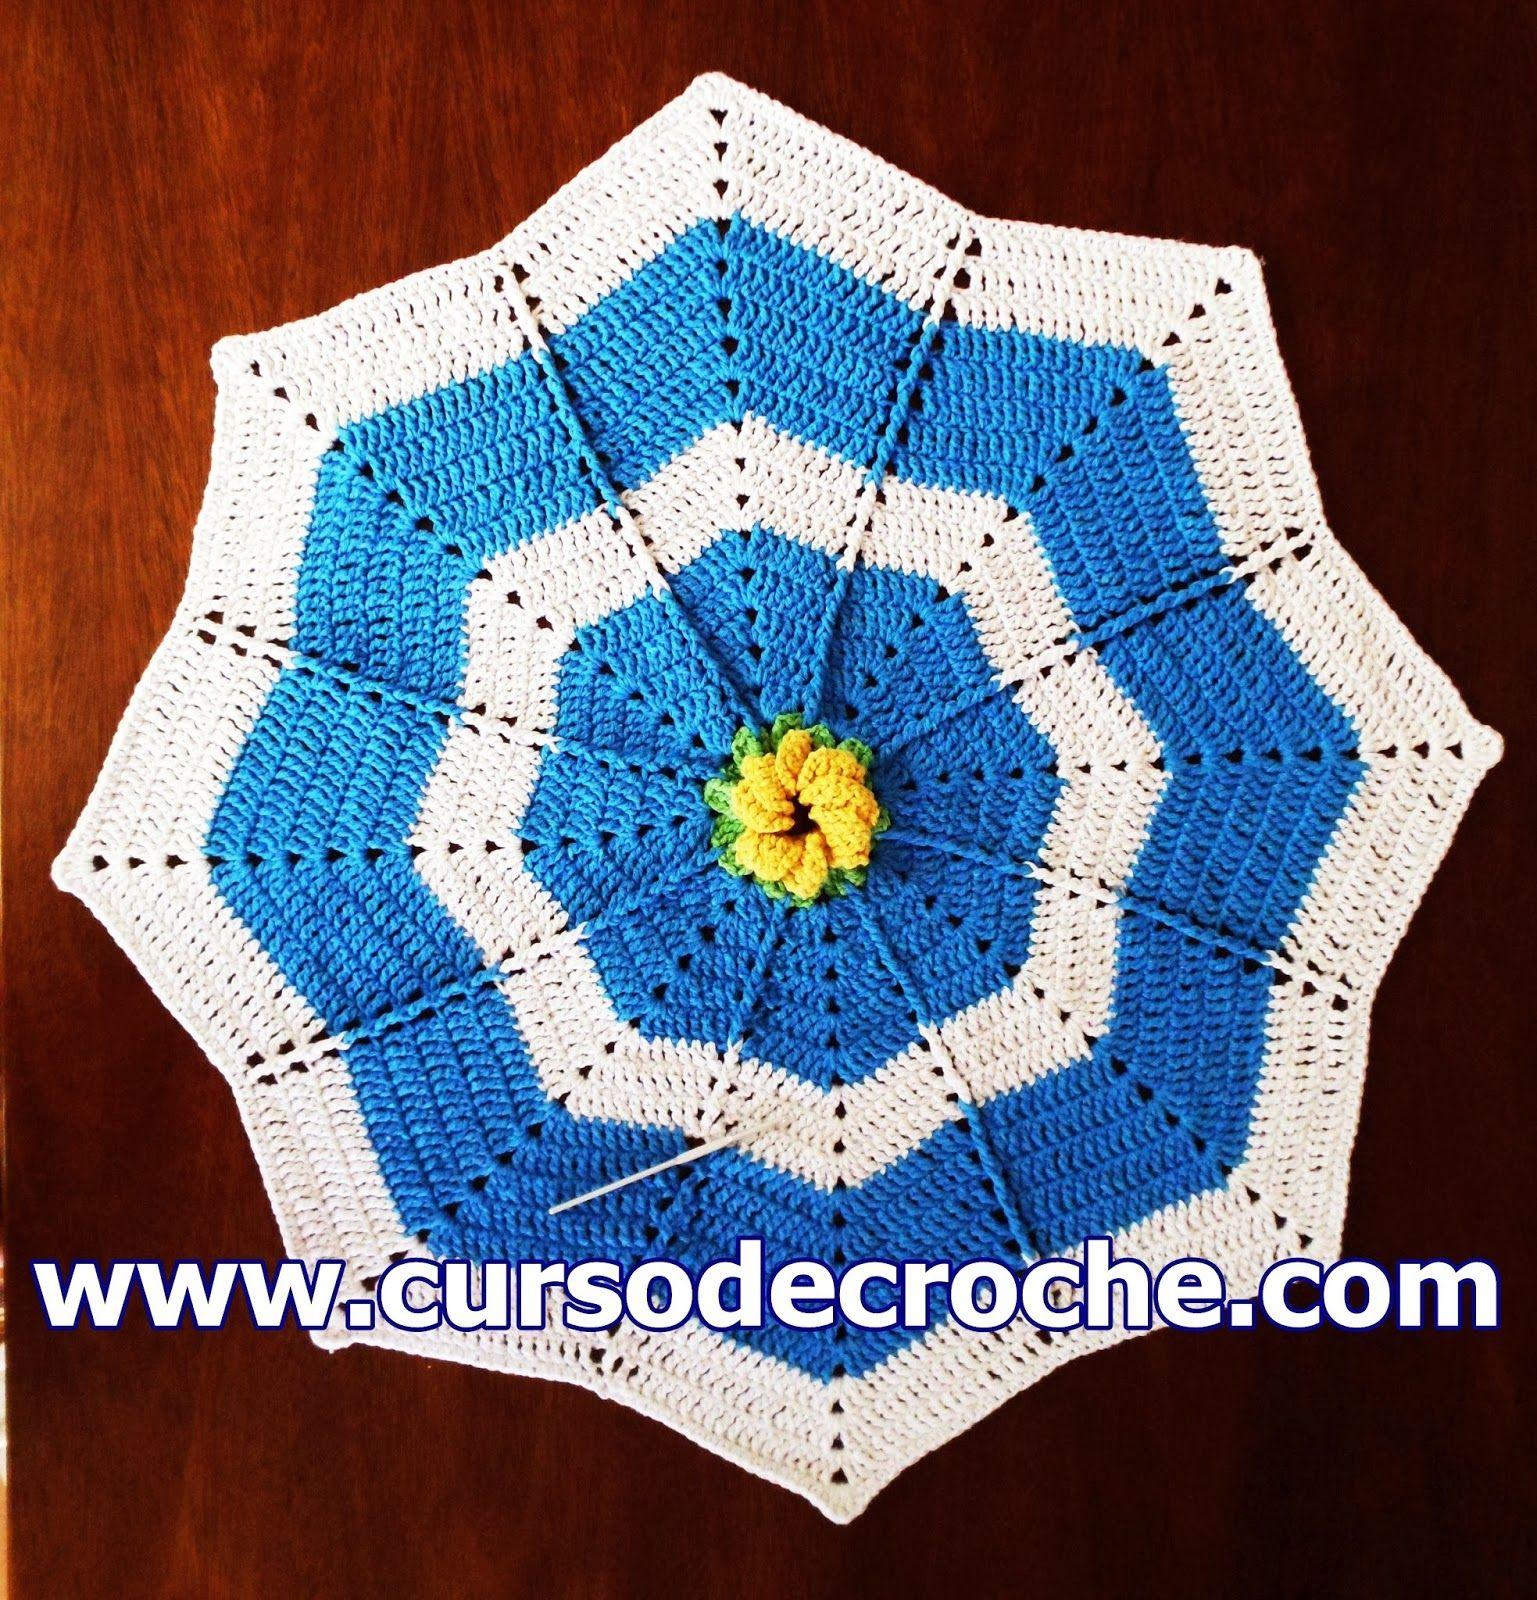 Edinir croch tapete em croch apolo estrela floral for Clases de tapetes